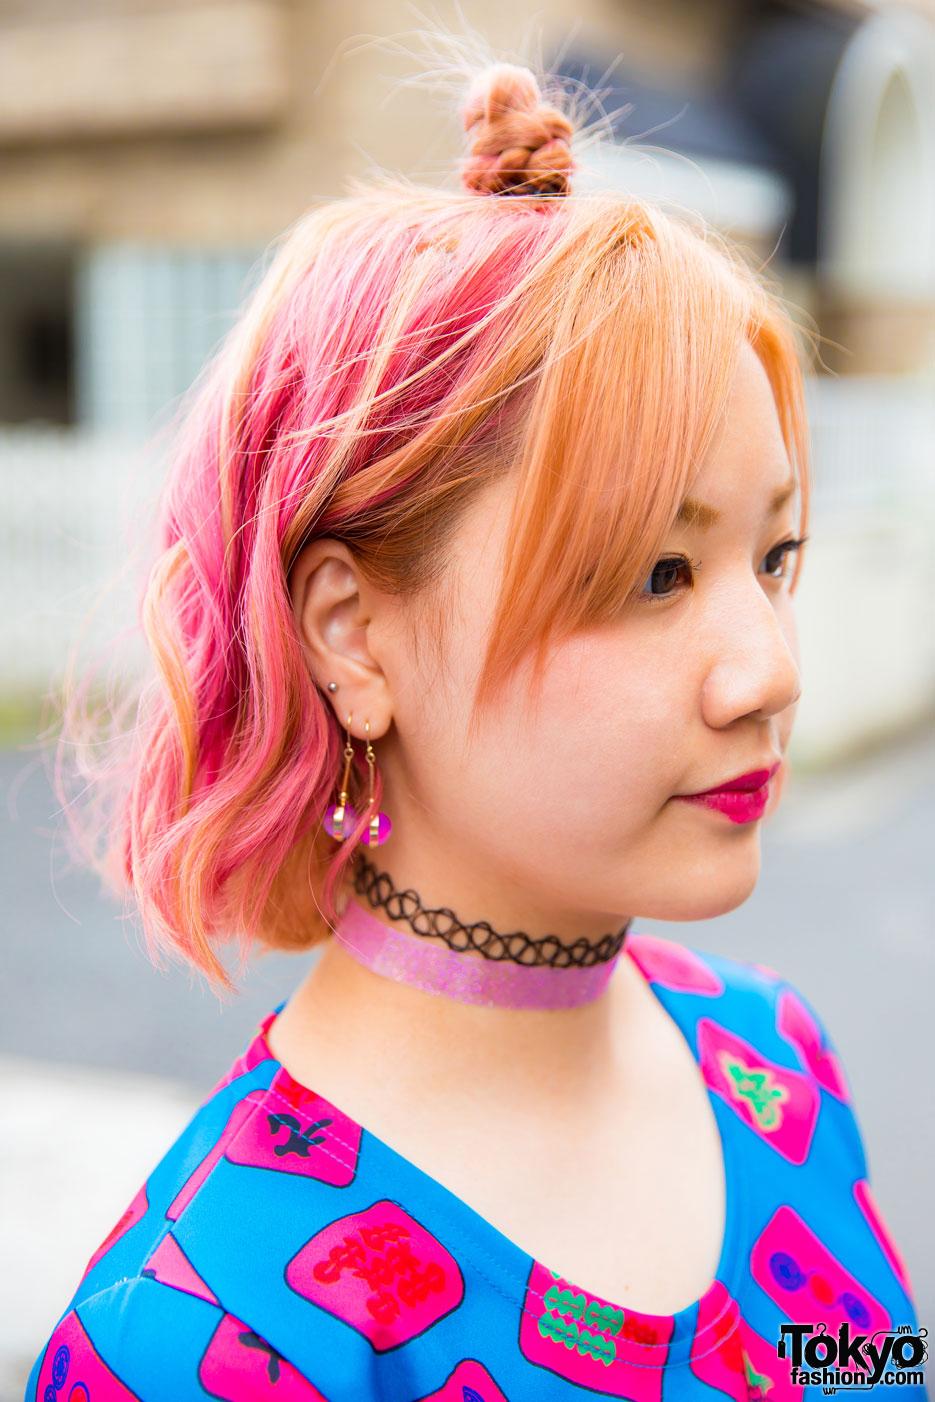 Japanese Pair Look Street Styles In Harajuku W Galaxxxy